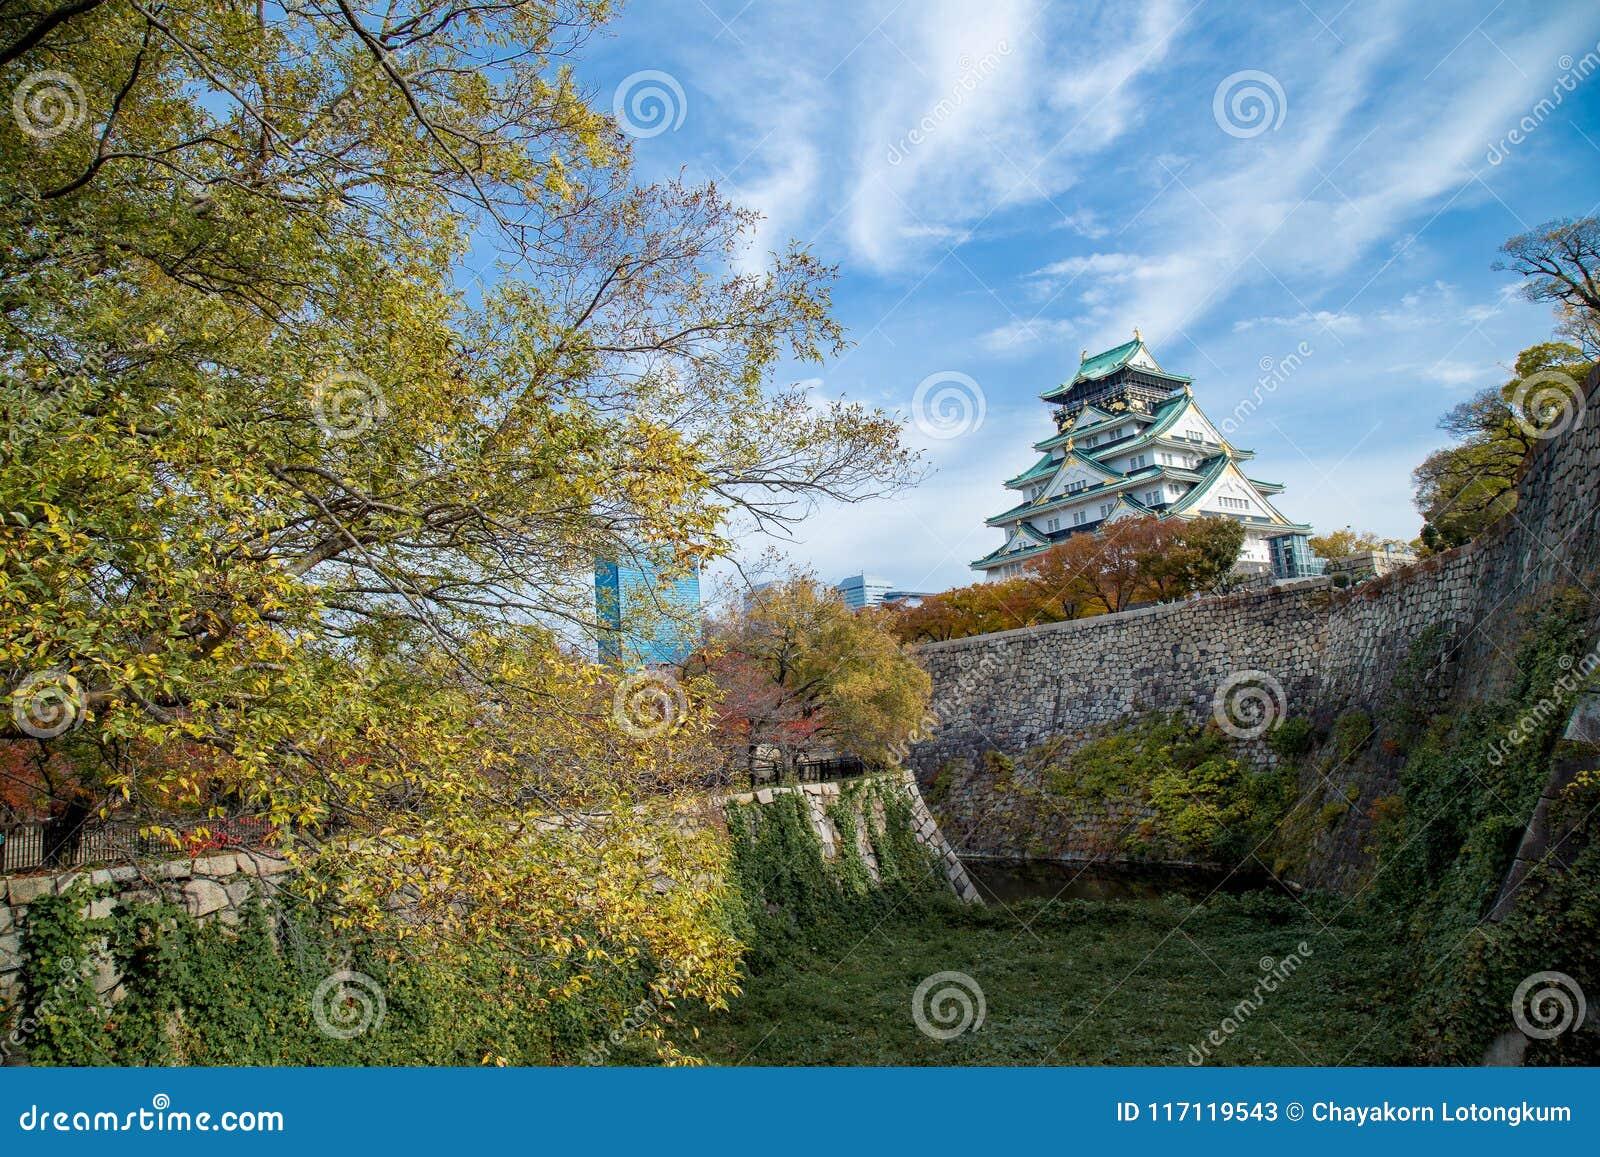 Osaka castle tower in japan, in Autumn